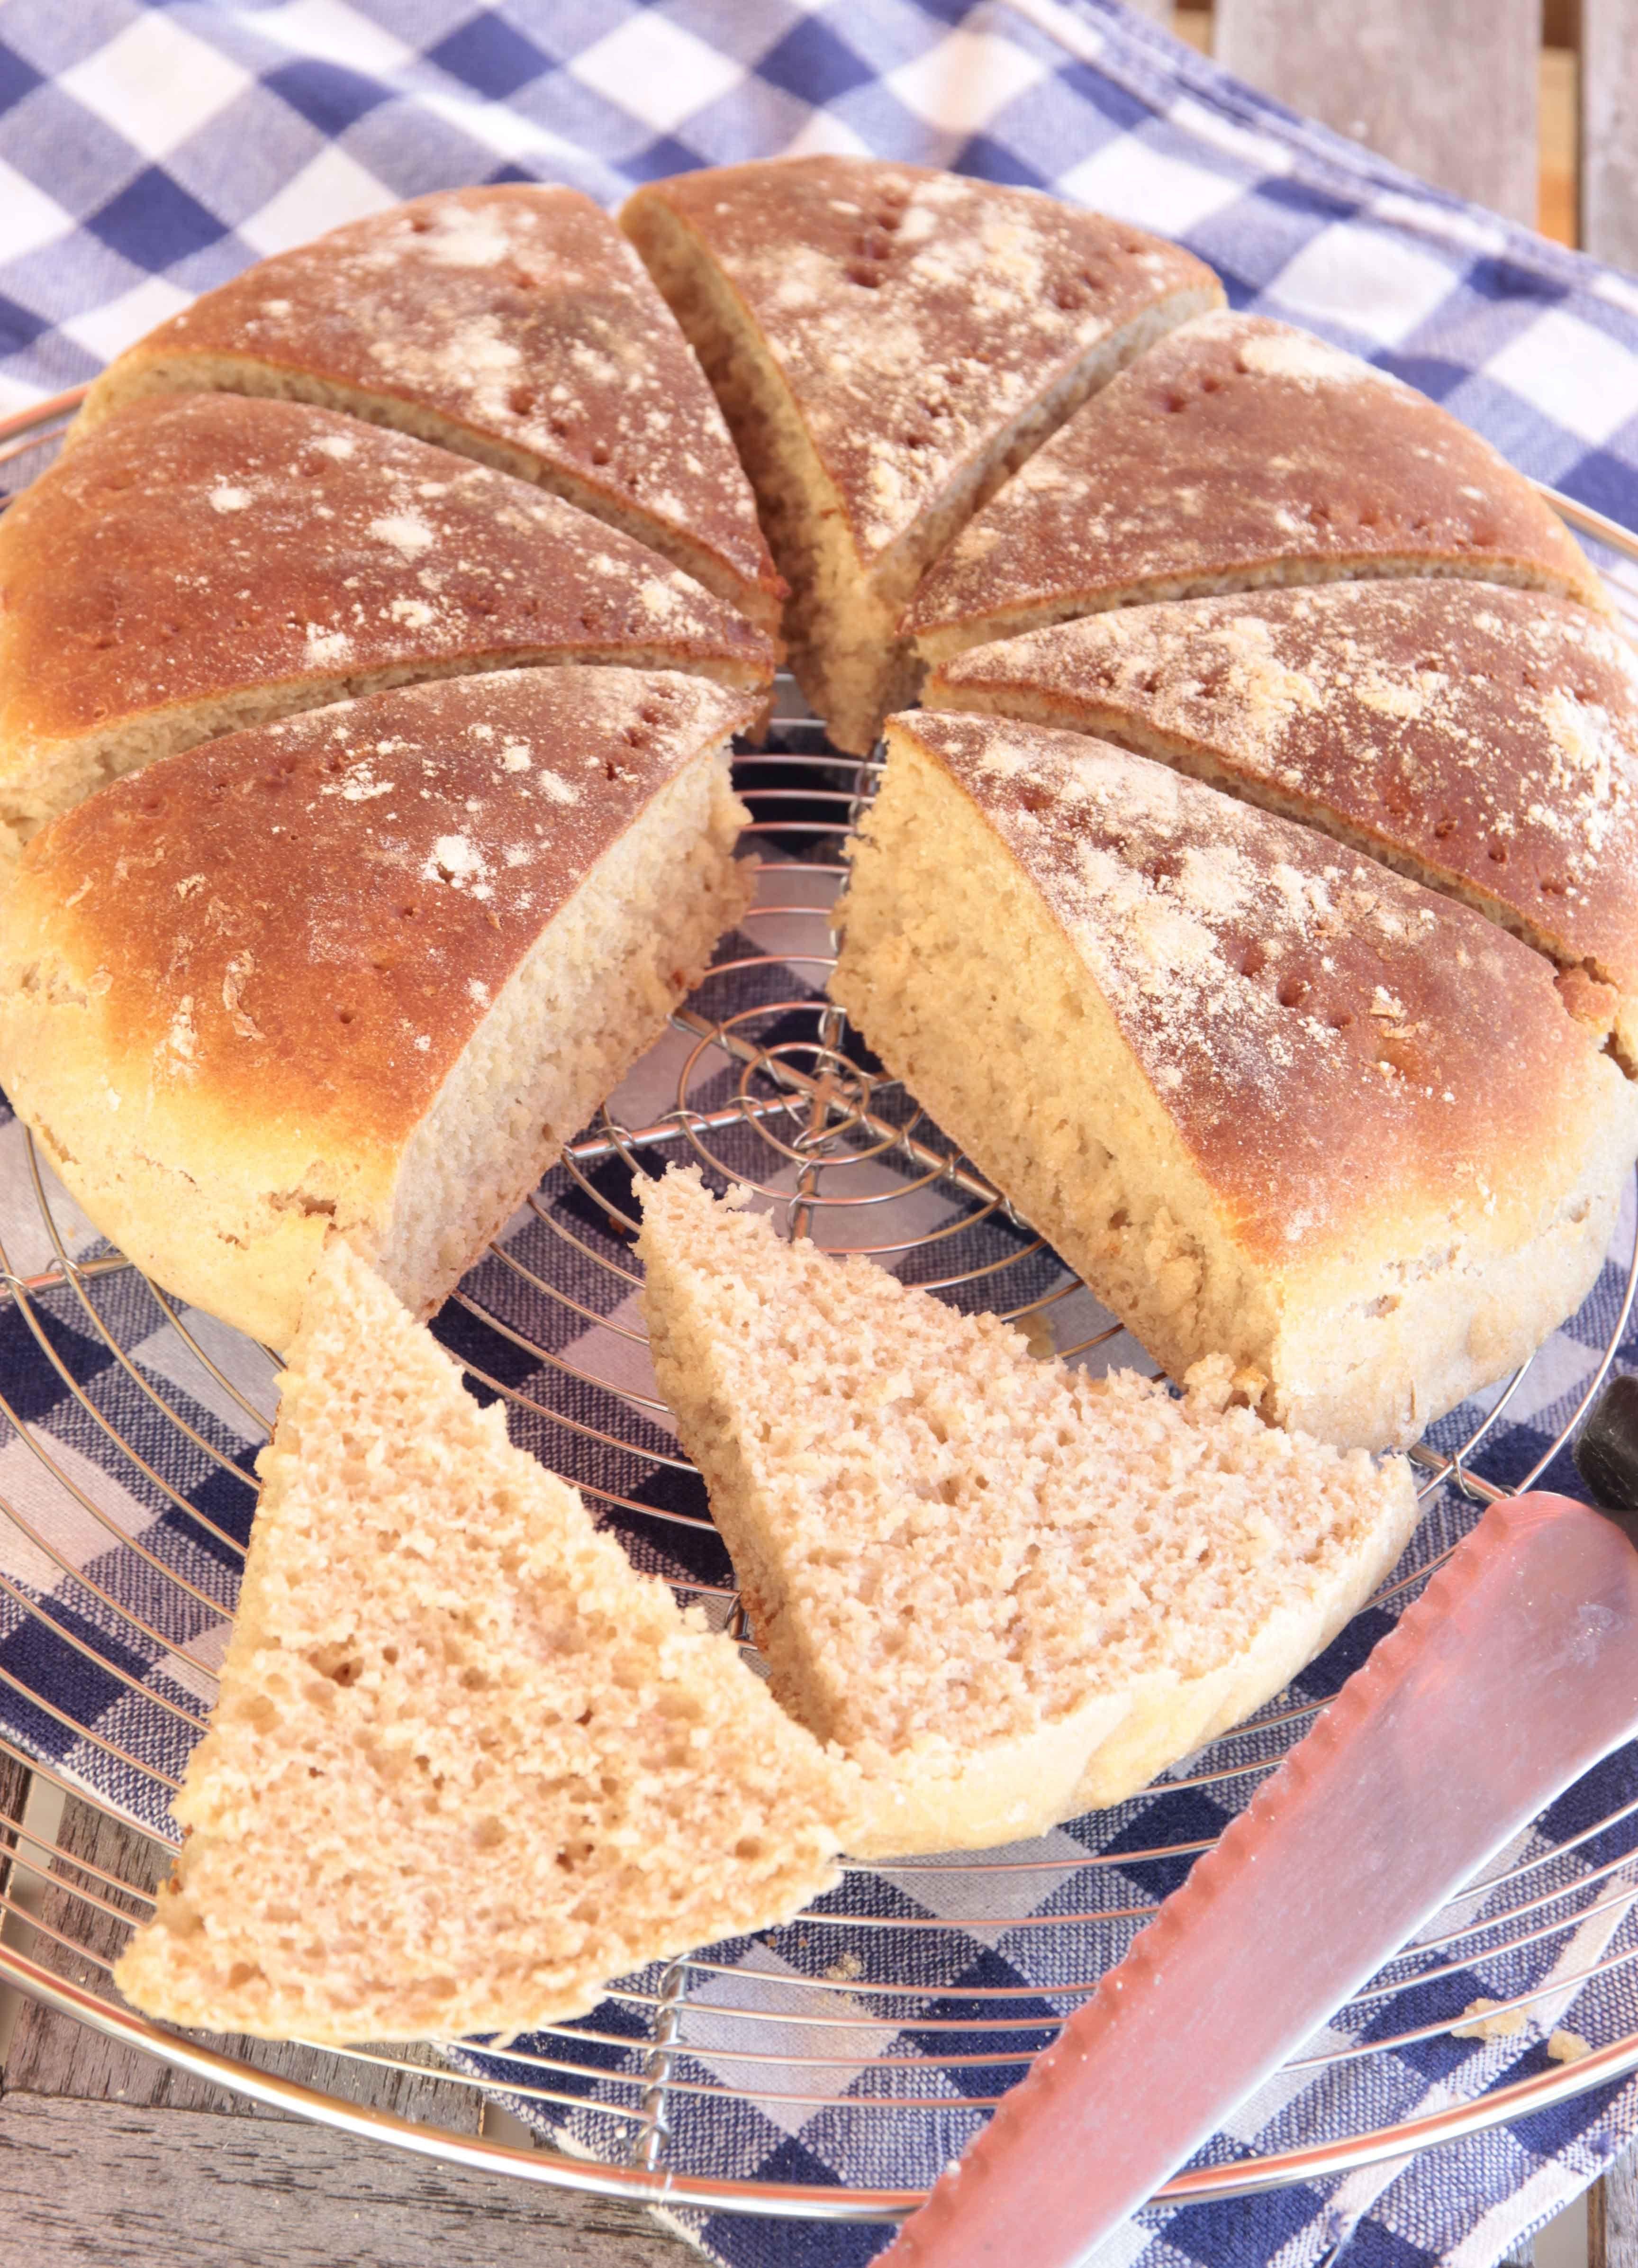 enkelt bröd i form